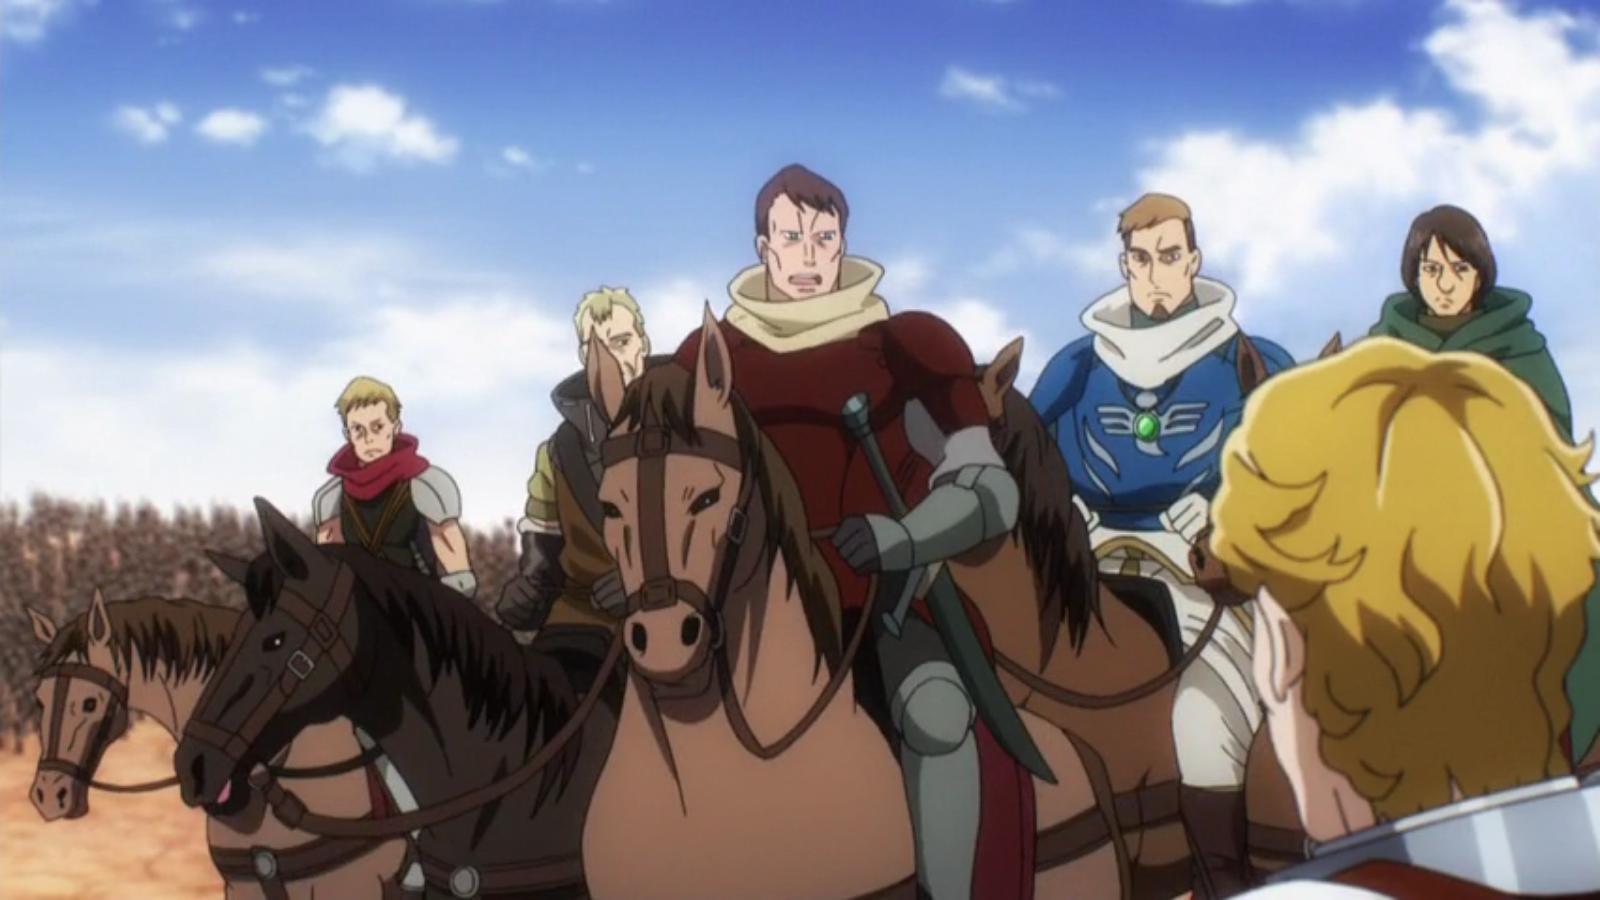 Marquis Raeven's Adventurer Team